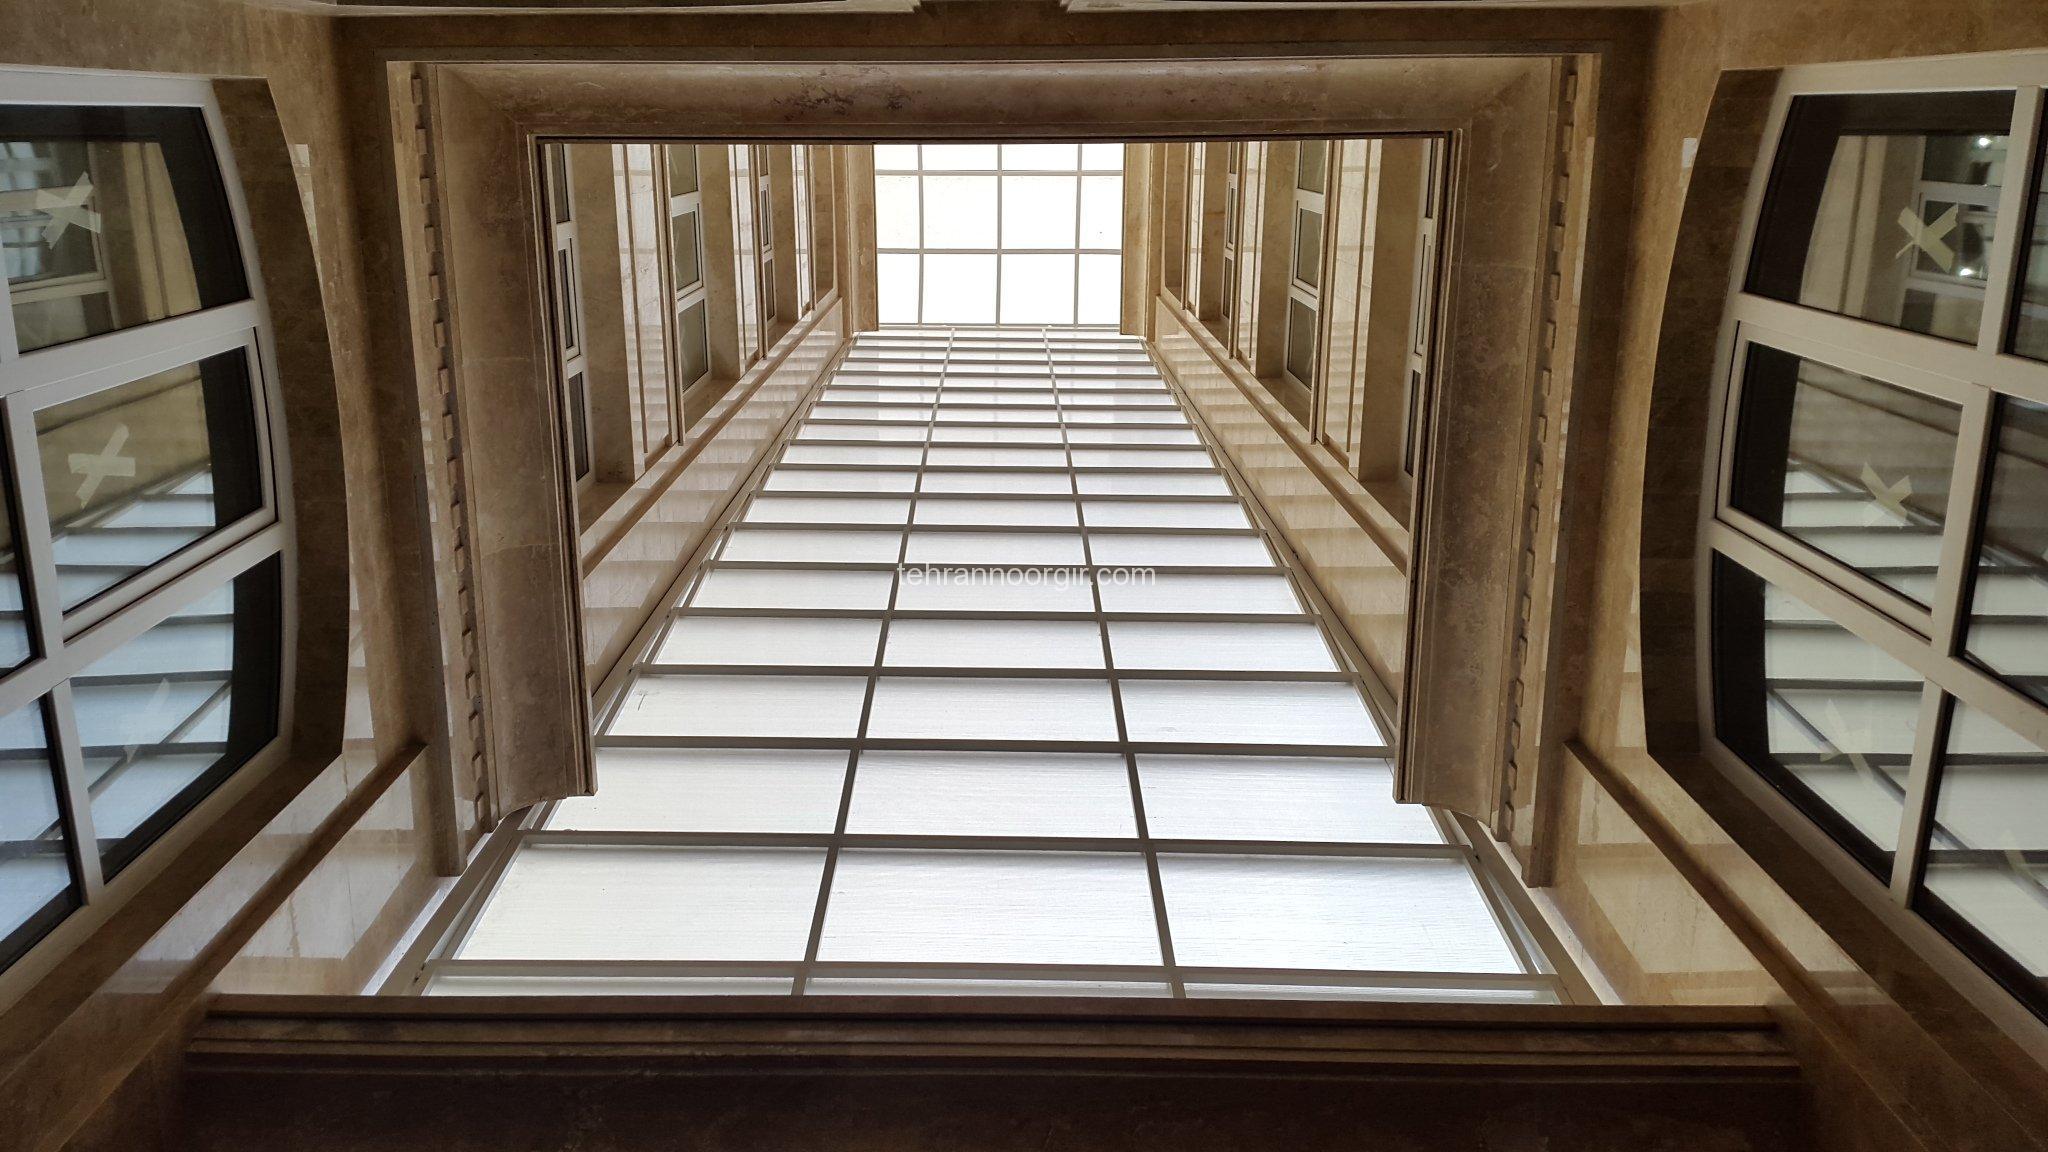 نورگیر سقفی و پوشش دیواره با ورق پلی کربنات 2 جداره